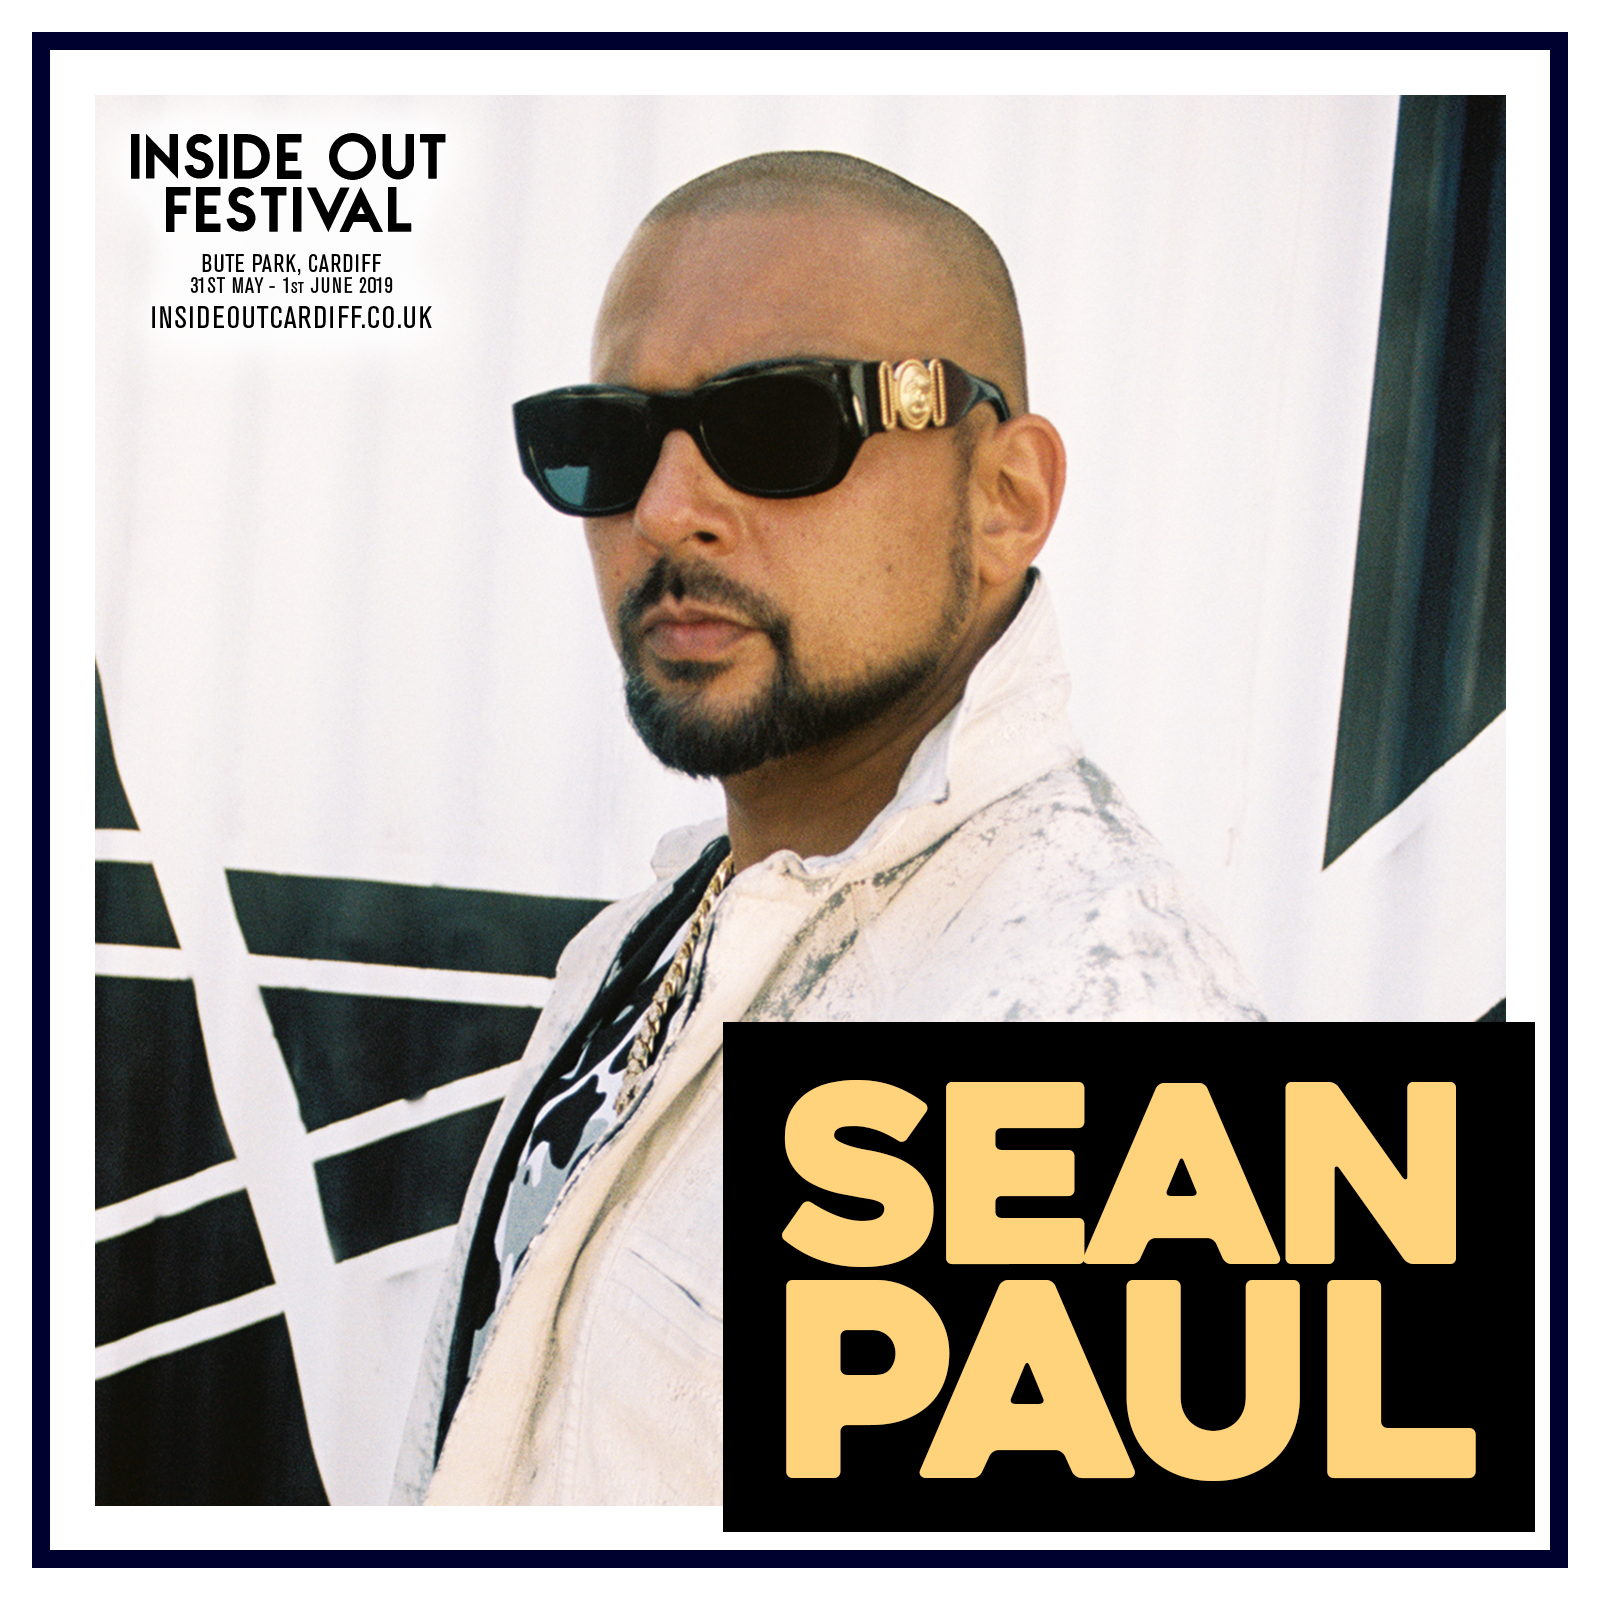 Sean Paul | Bute Park Cardiff